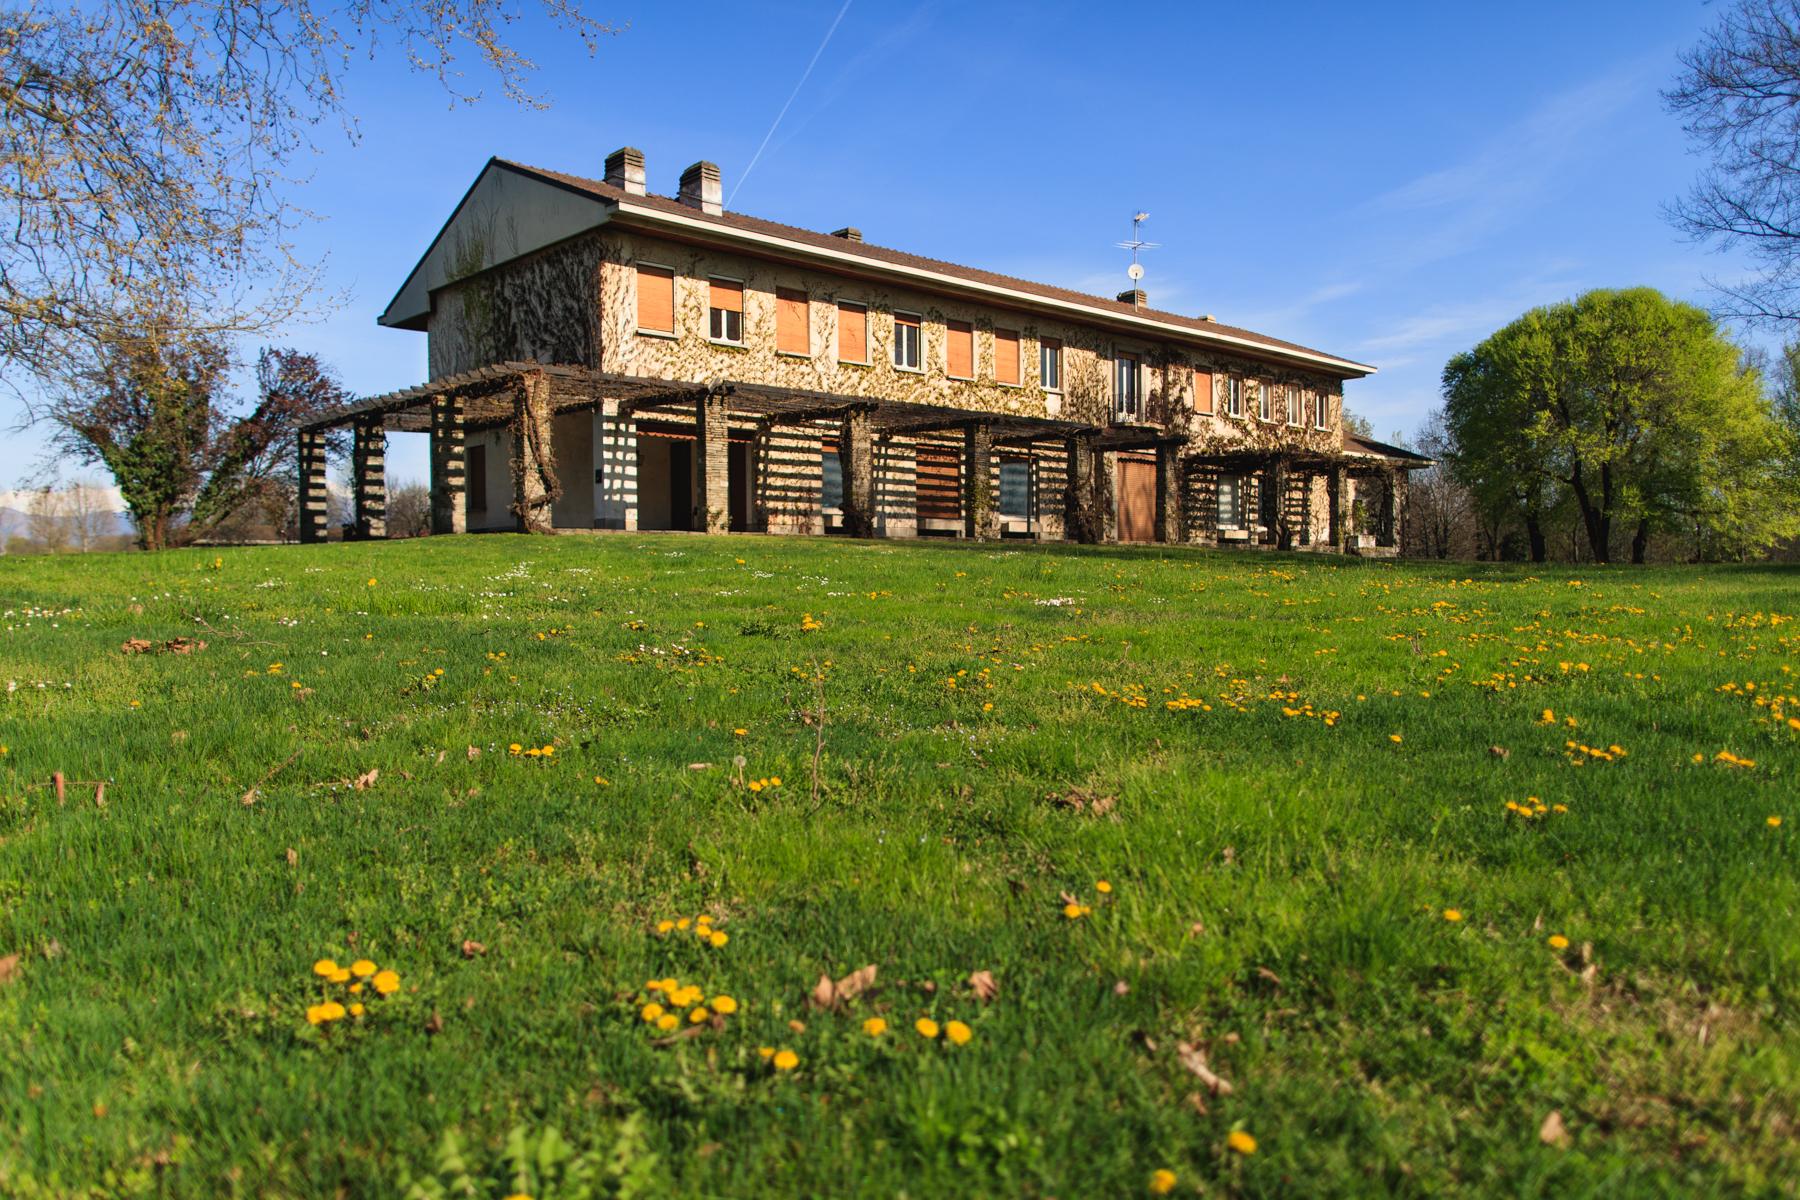 Casa indipendente in Vendita a Venaria: 5 locali, 1000 mq - Foto 2